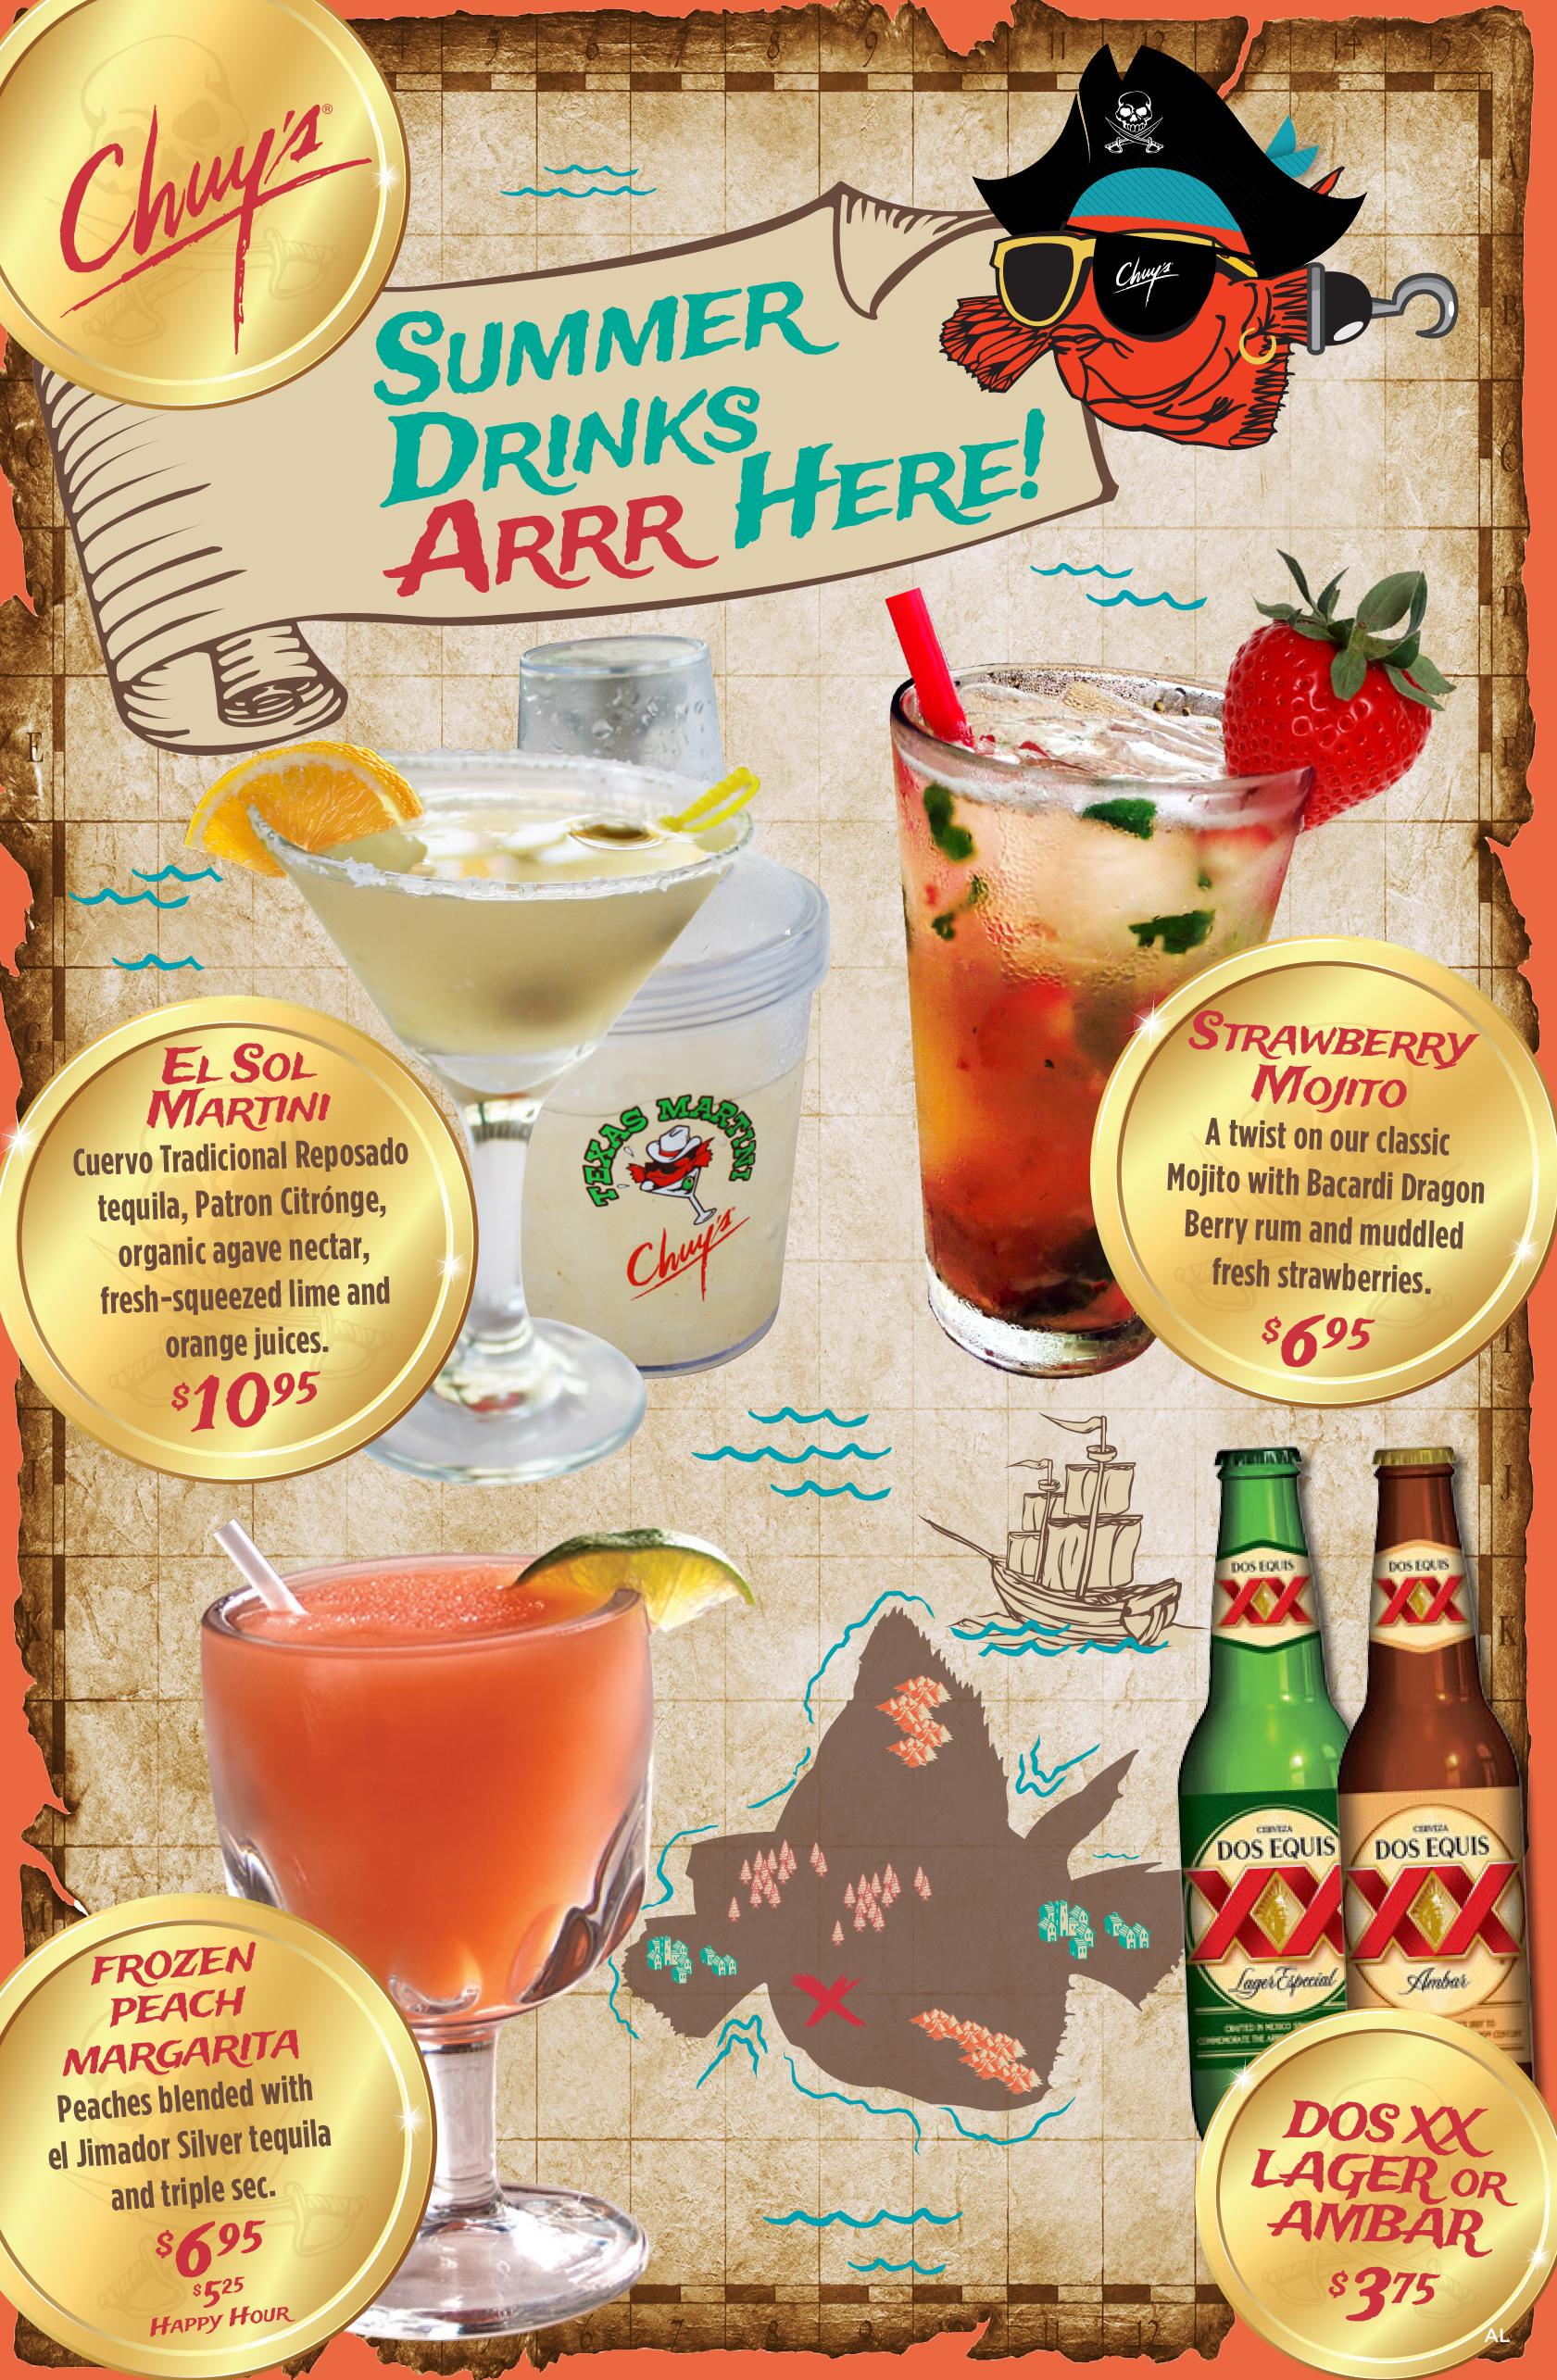 14-CHUYS-06549-Summer-Drink-Menu-Cover-AL-HR-FNL.jpg